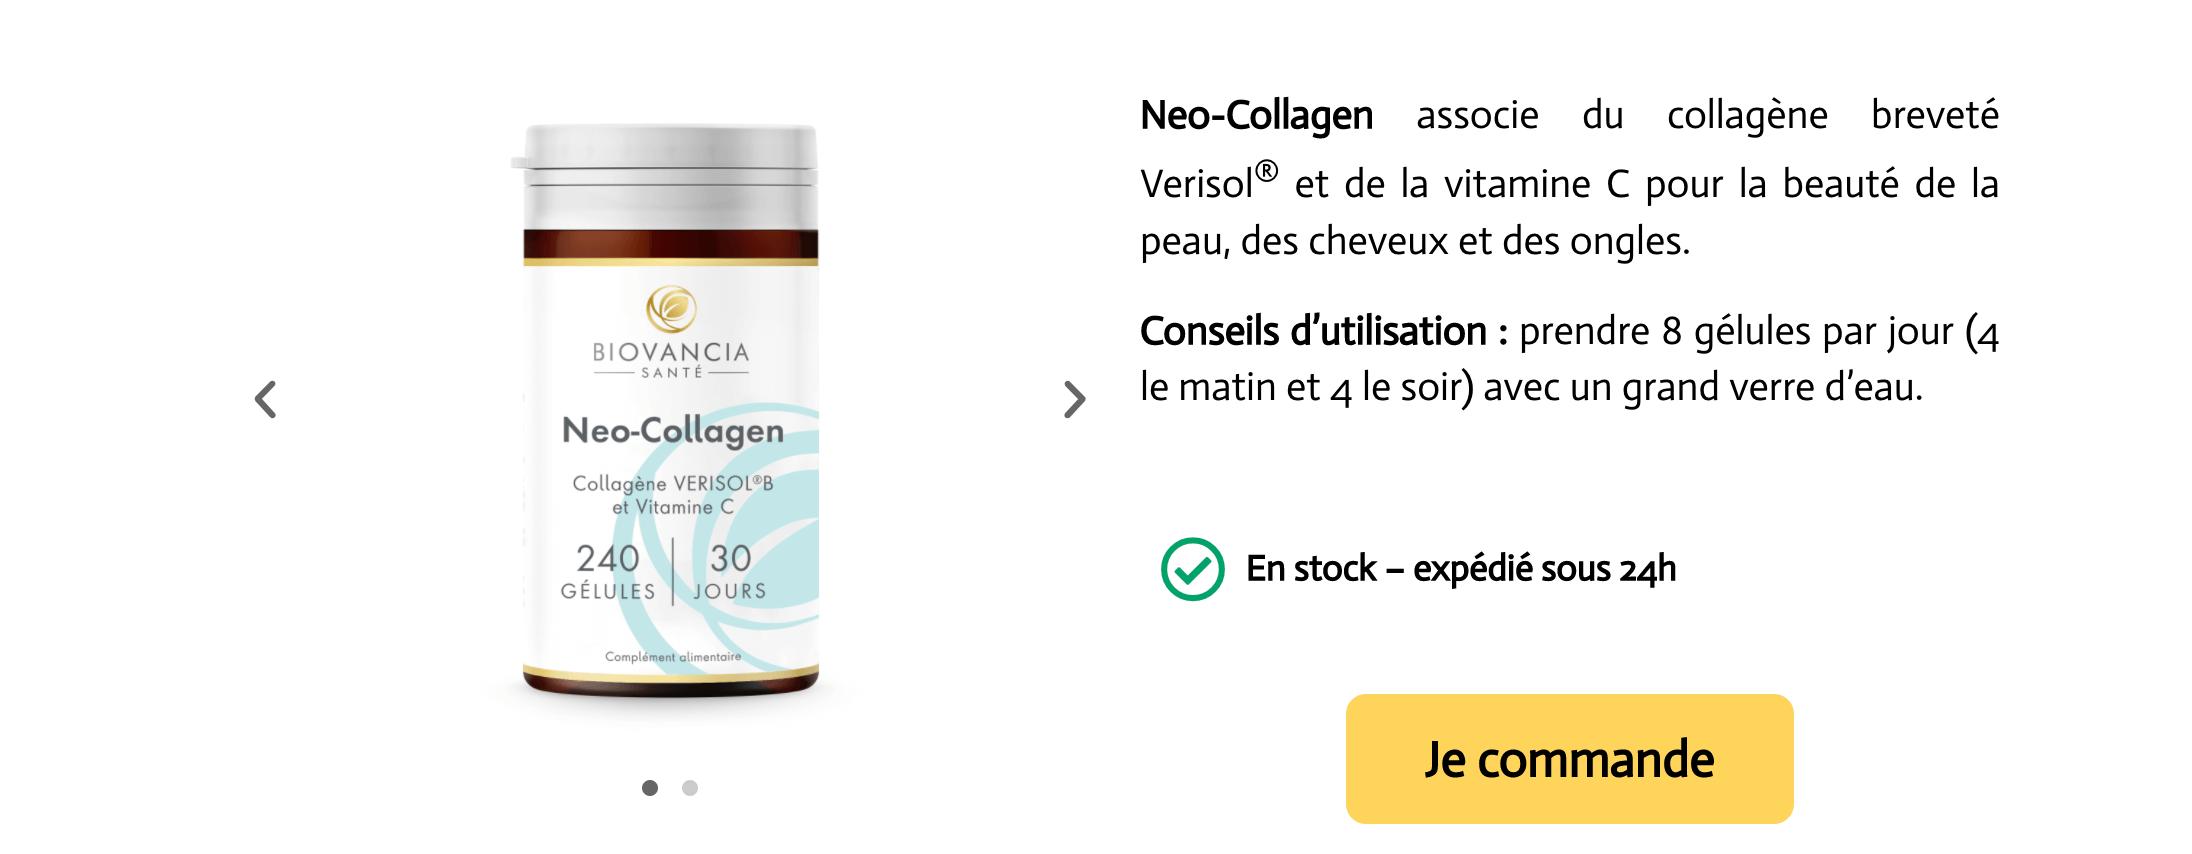 Neo collagen Verisol avis